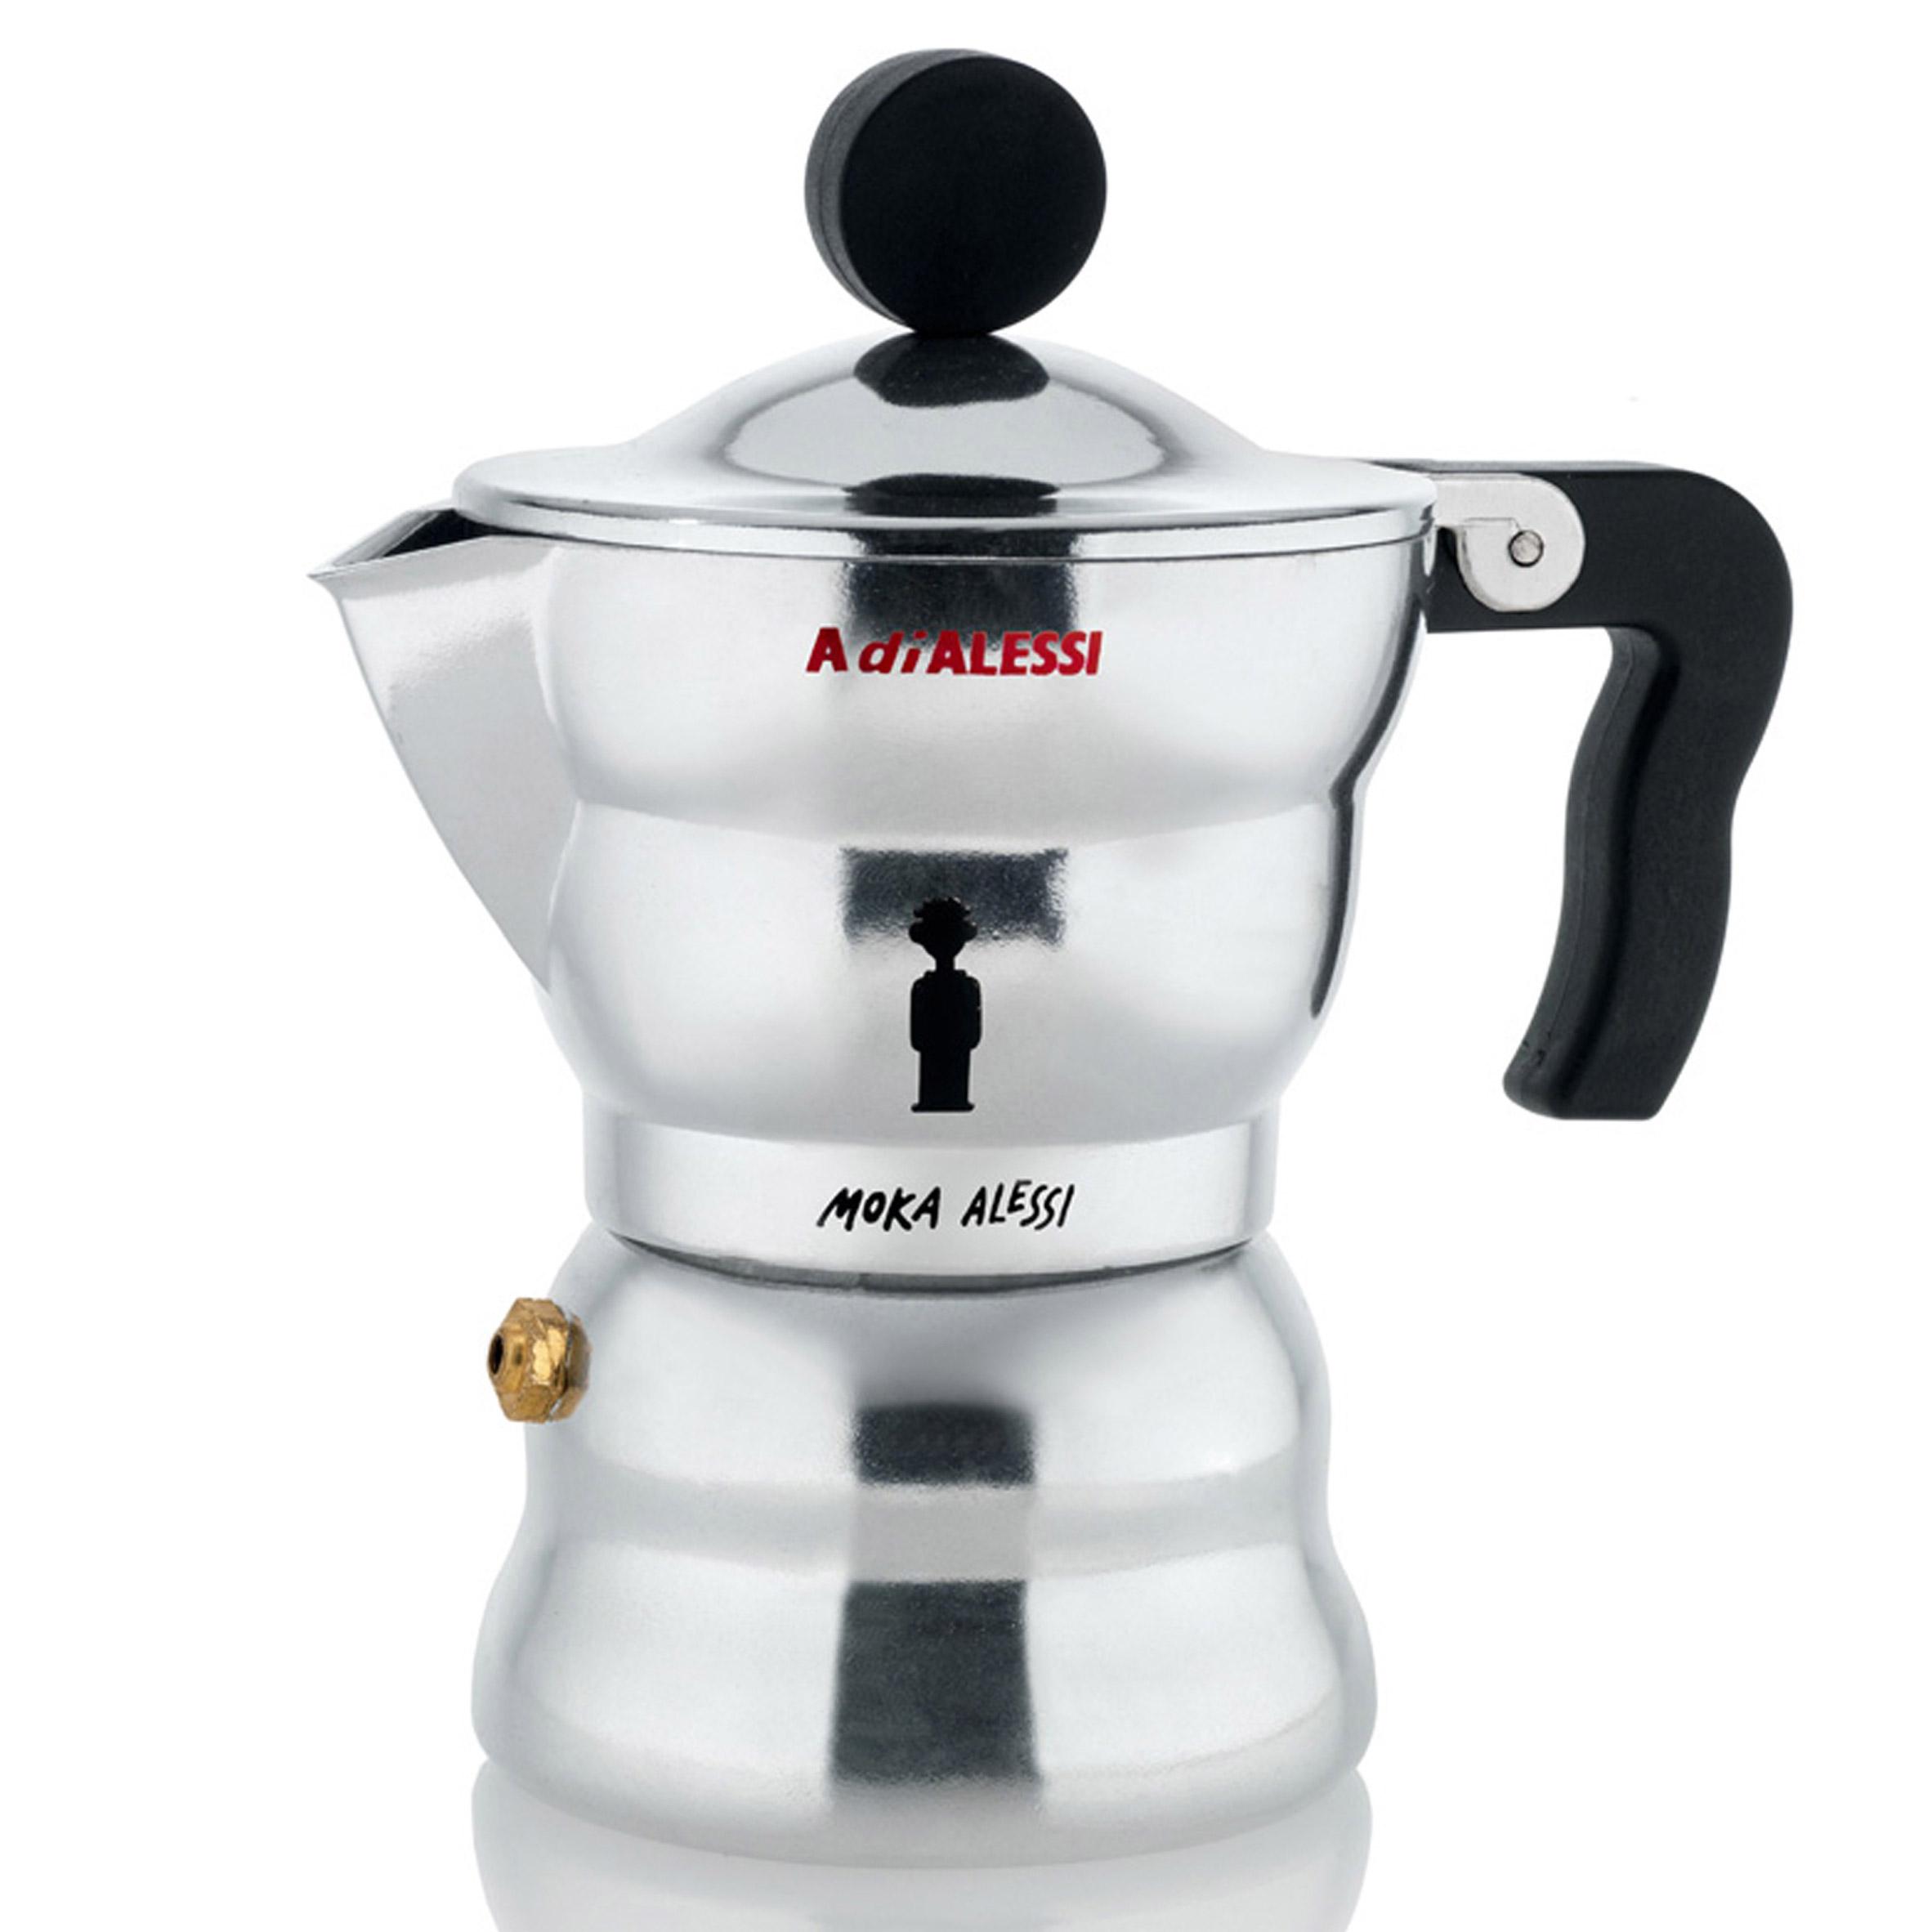 Moka Alessi coffee maker, 2011, by Alessandro Mendini